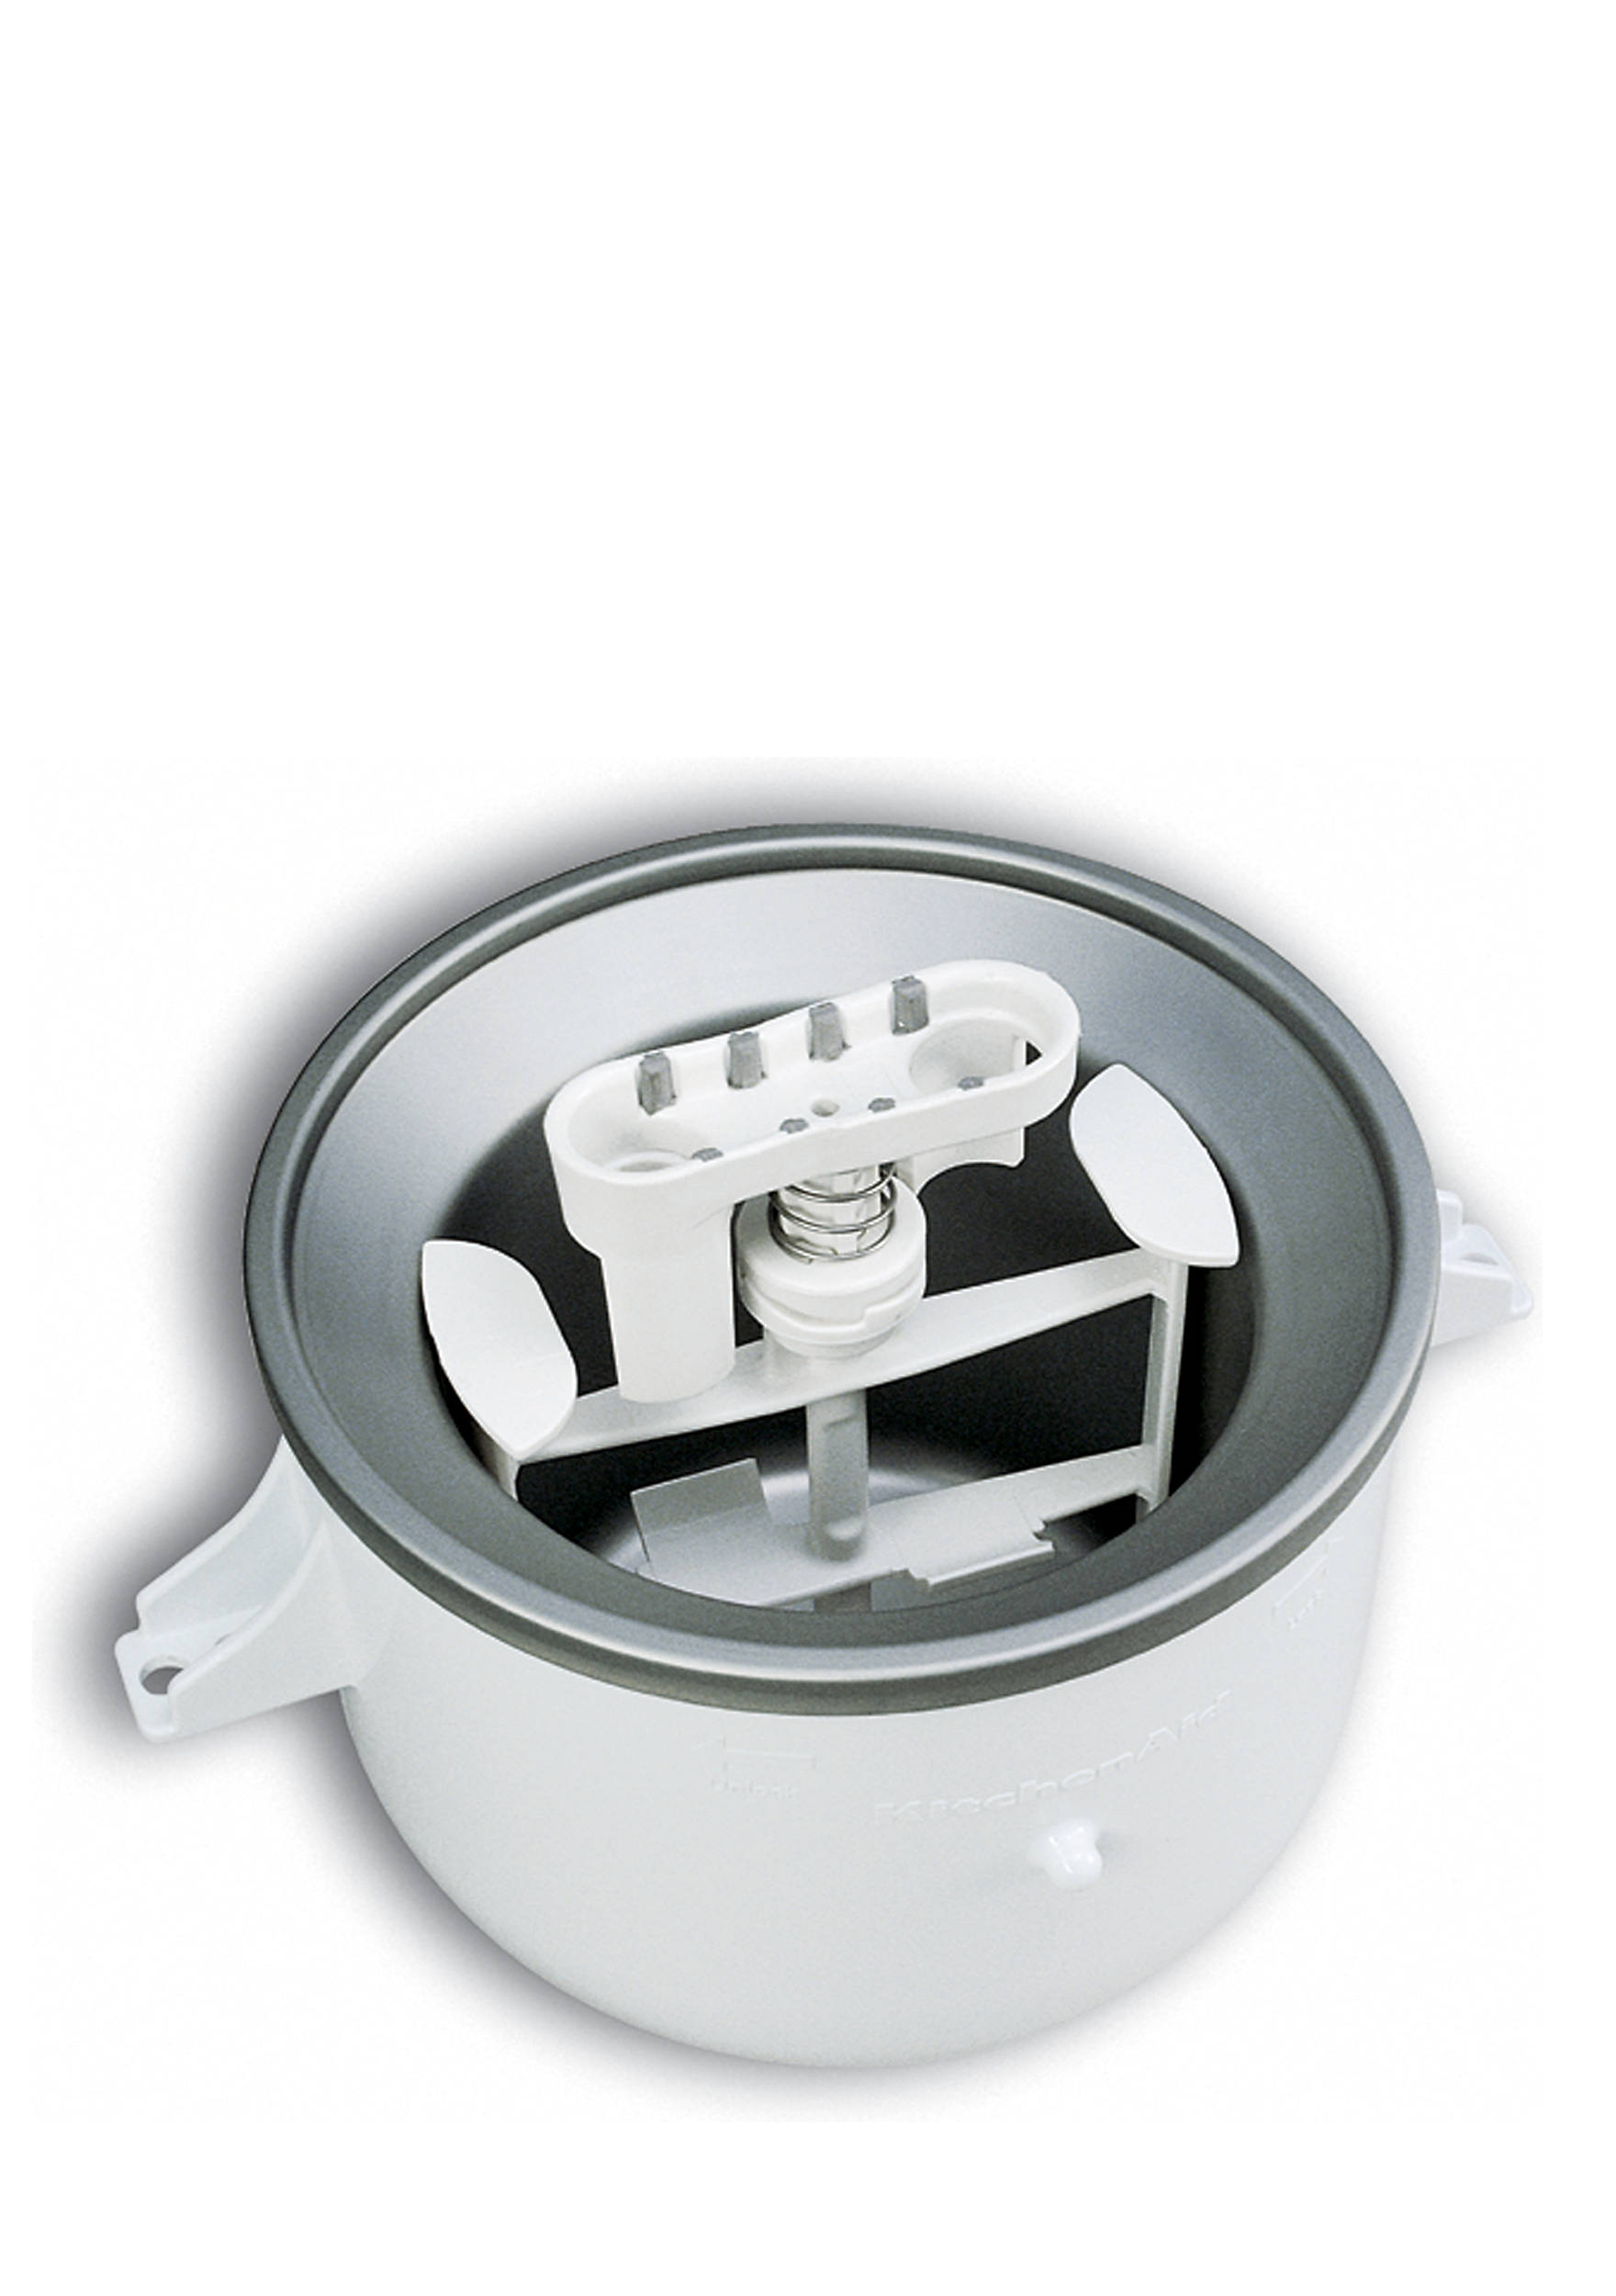 KitchenAid® Ice Cream Maker Stand Mixer Attachment KICA0WH | belk